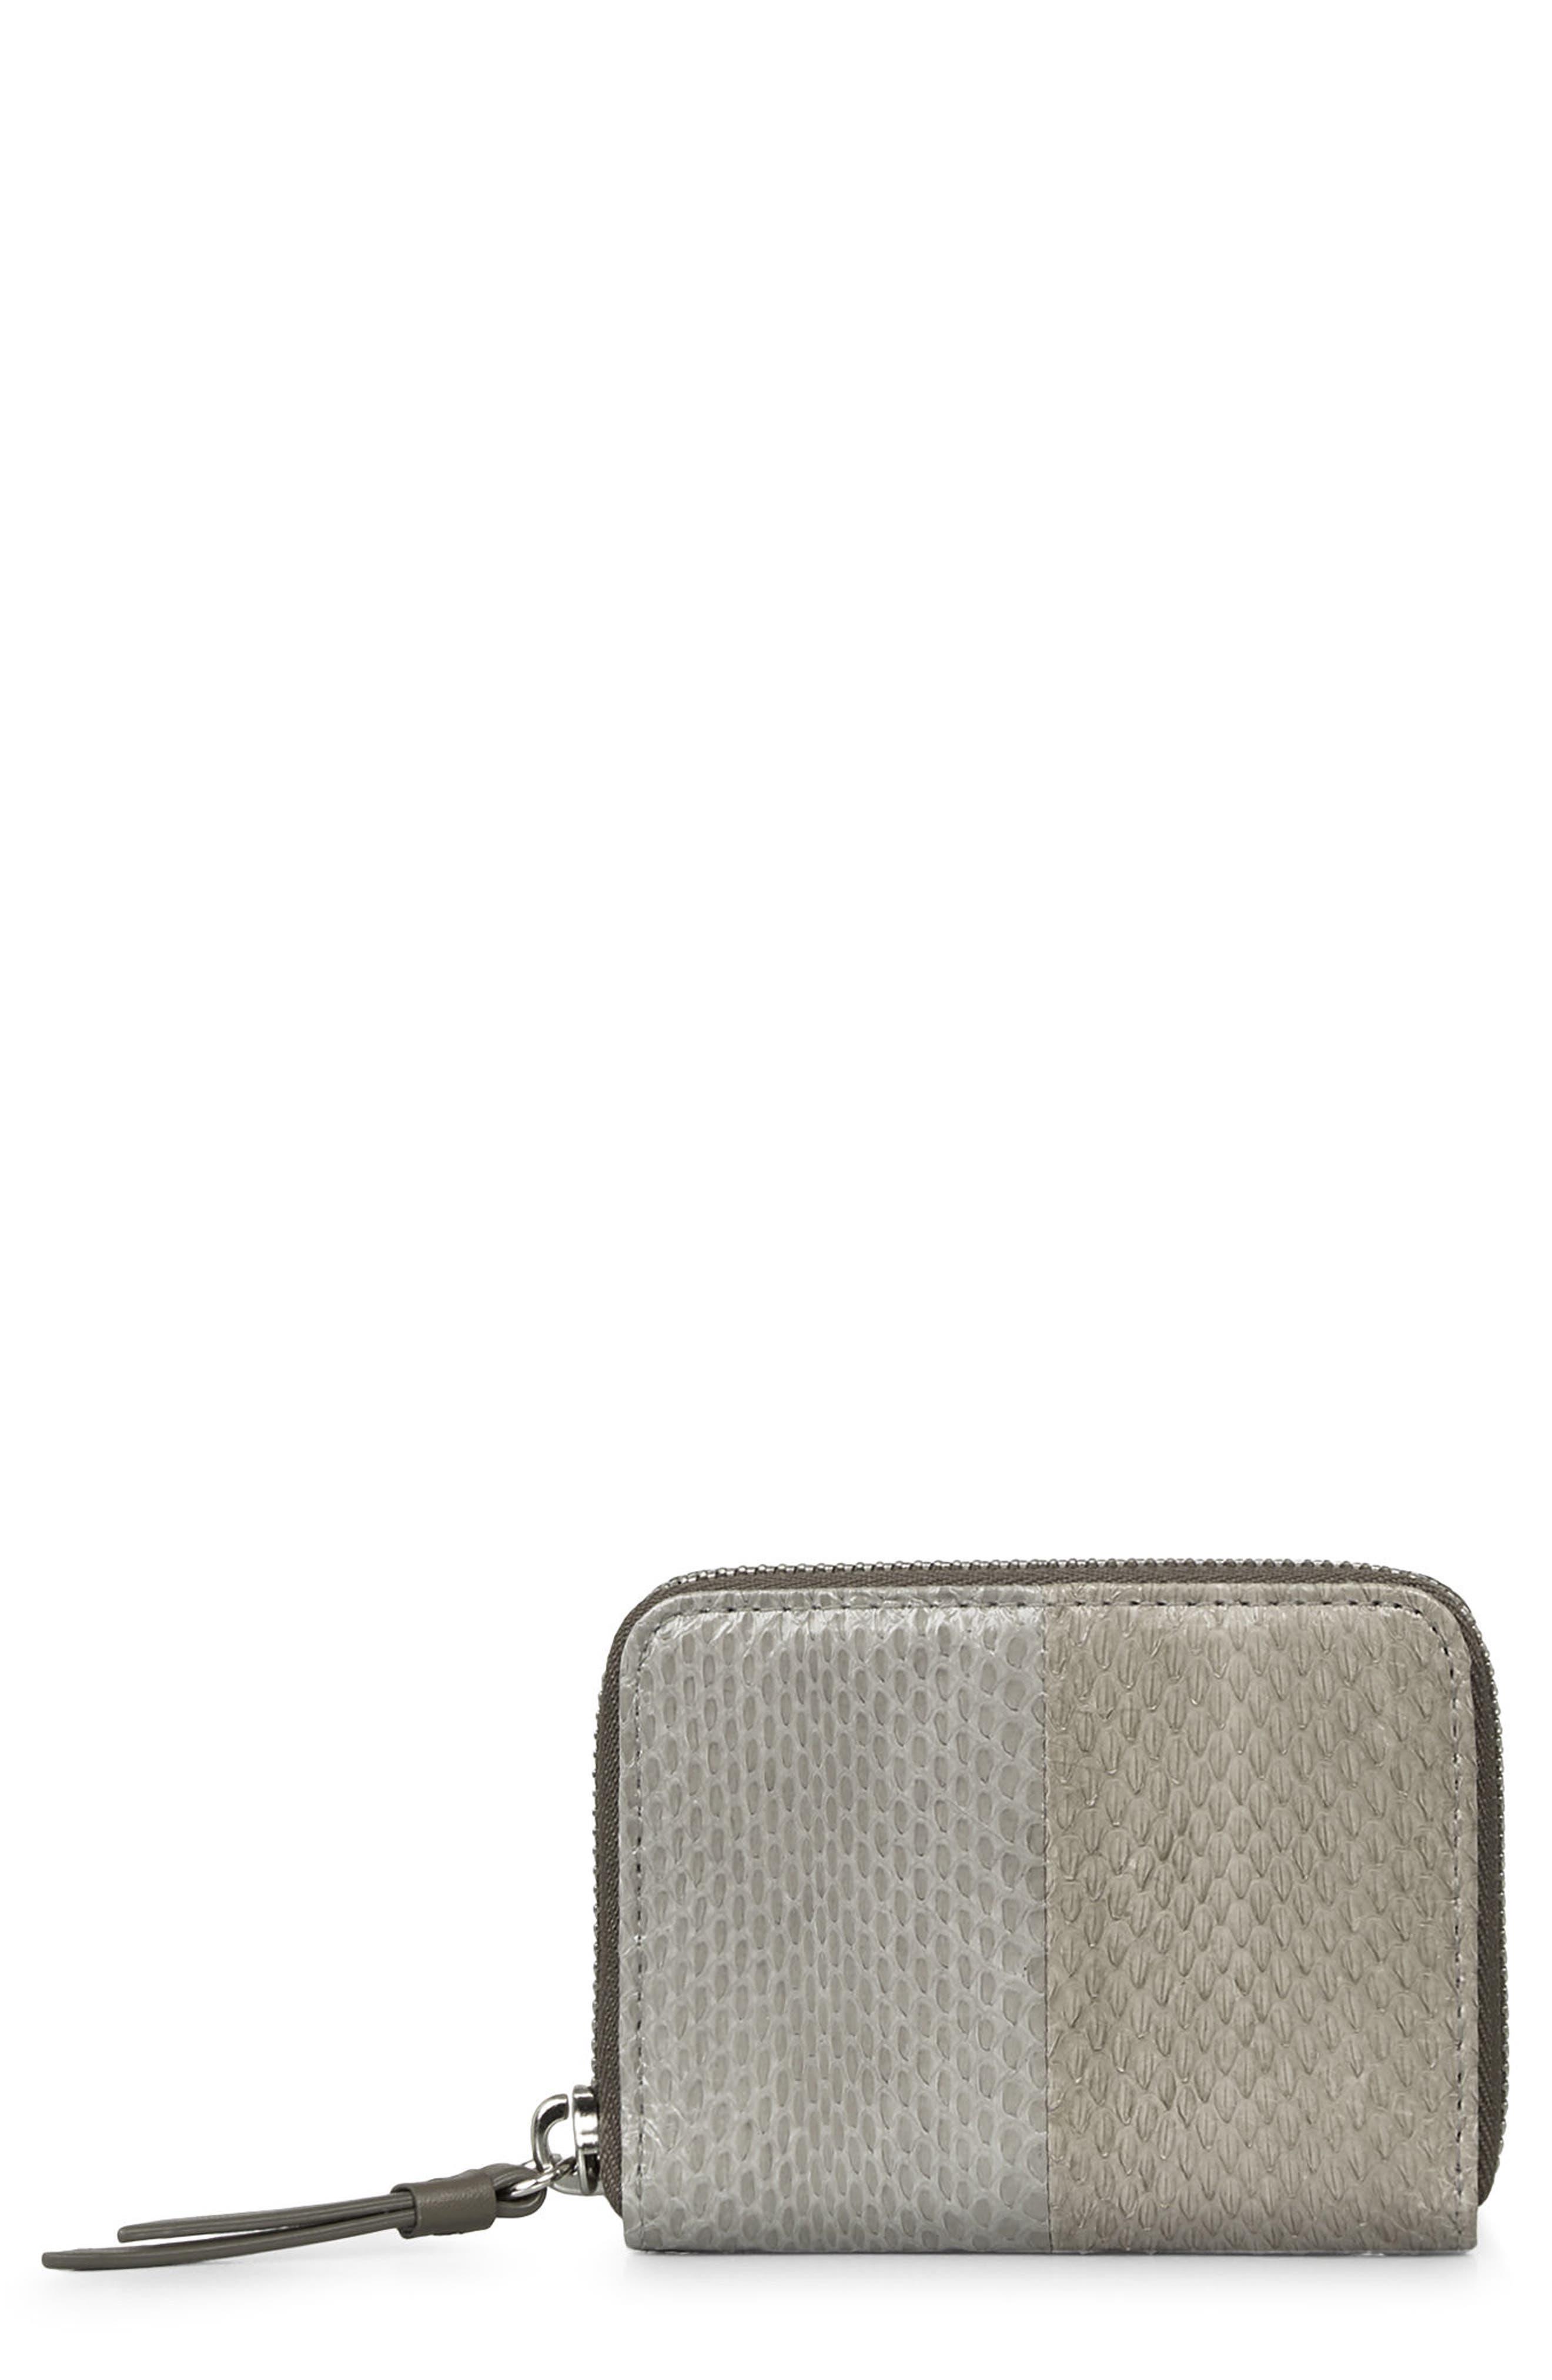 Main Image - ALLSAINTS Ikuya Leather & Genuine Snakeskin Wallet